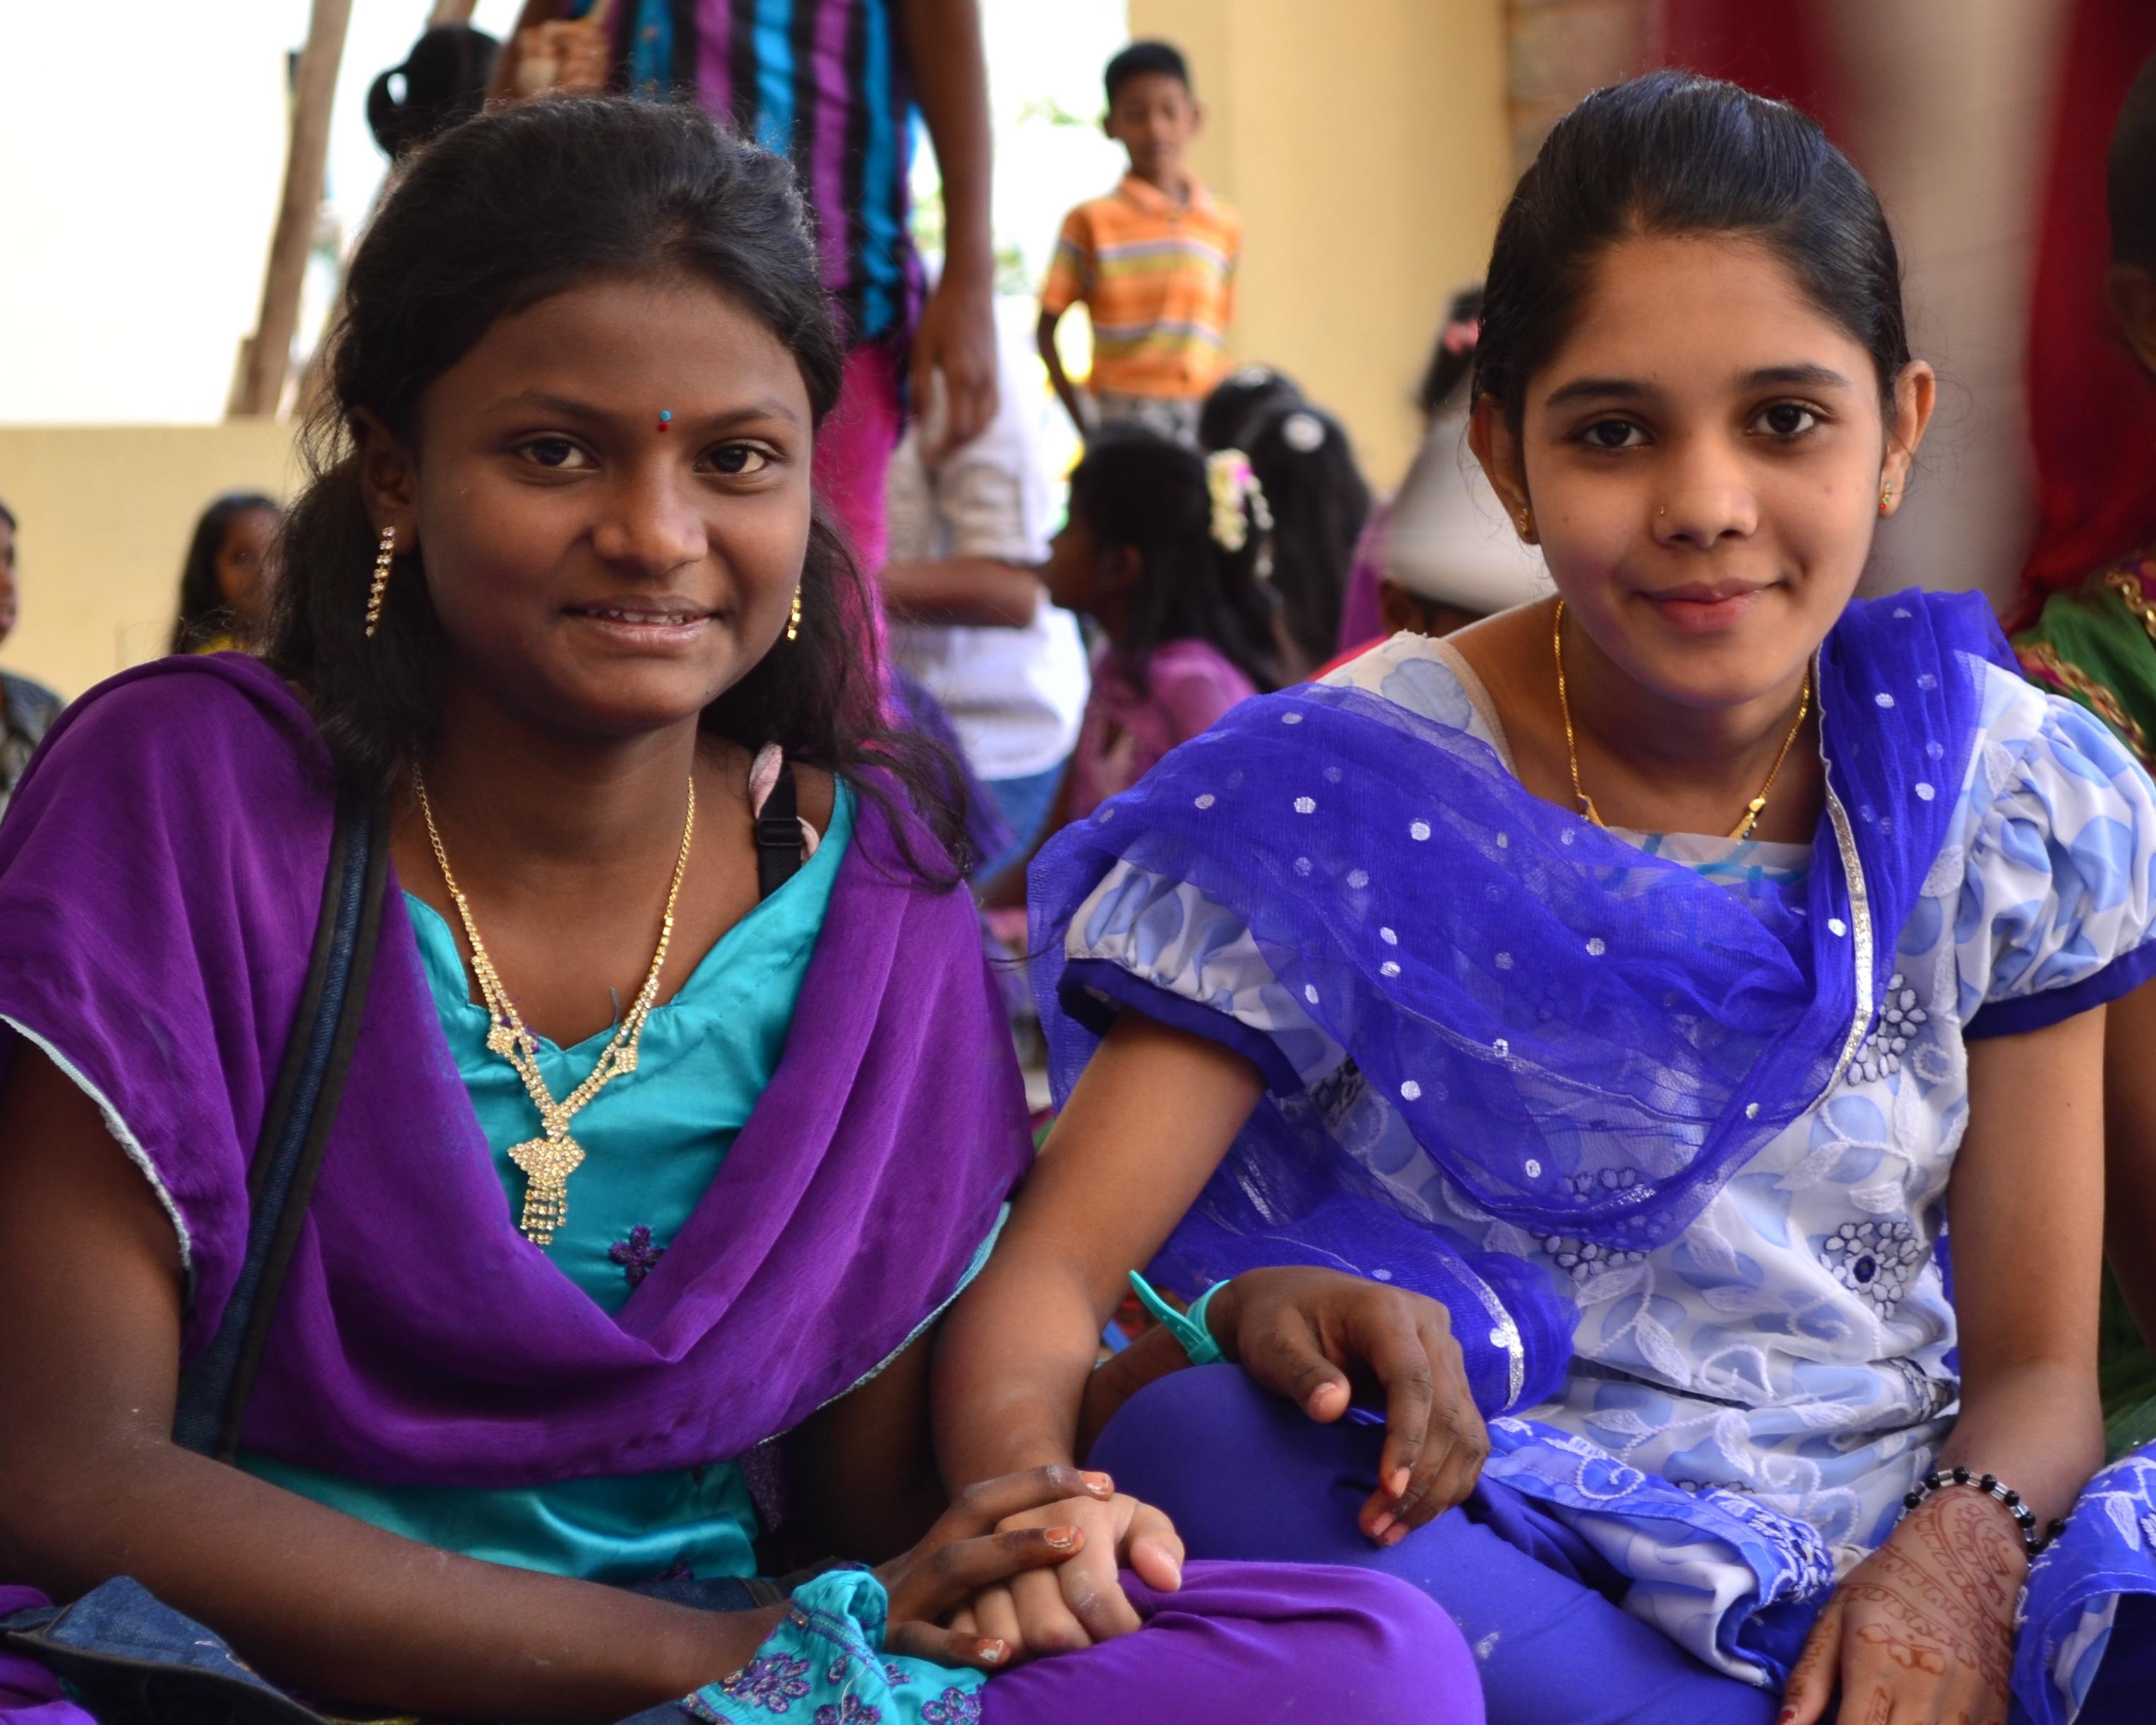 Children's Creativity programme in the slum were invited to participate in science experiments